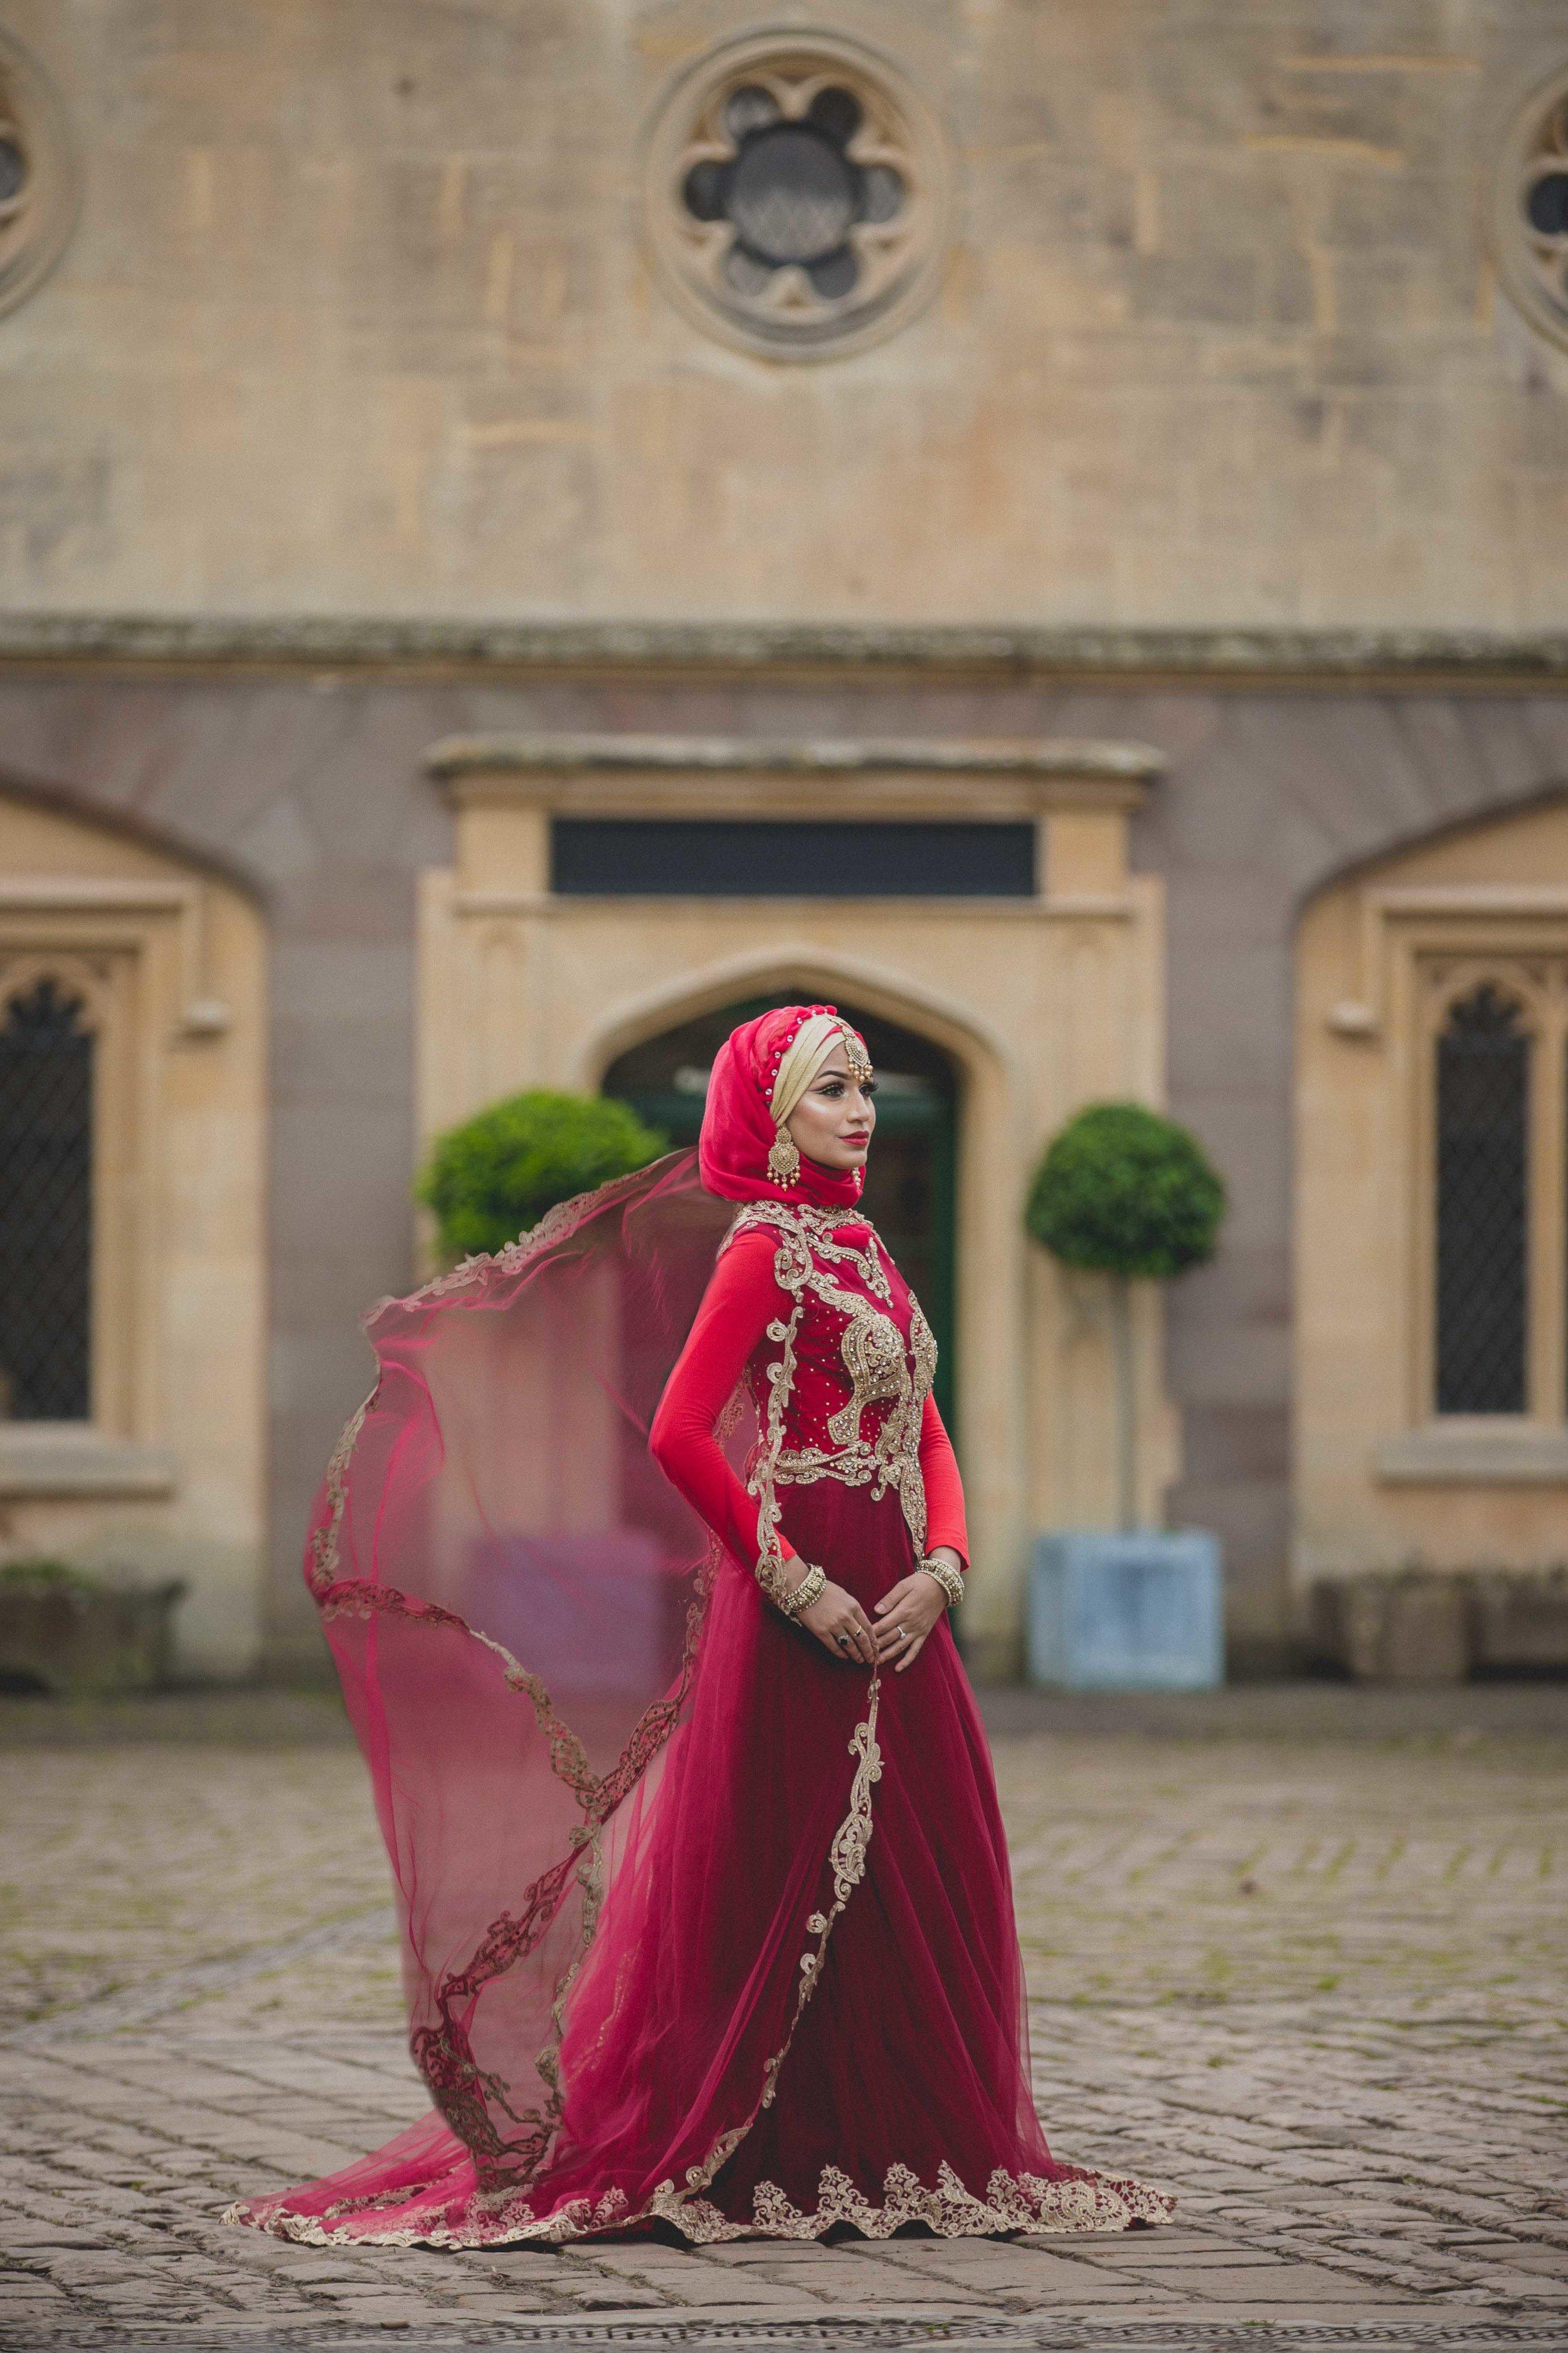 ashton-court-bristol-asian-bride-wedding-modest-street-aisha-rahman-fashion-photography-london-bristol-natalia-smith-photography-15.jpg